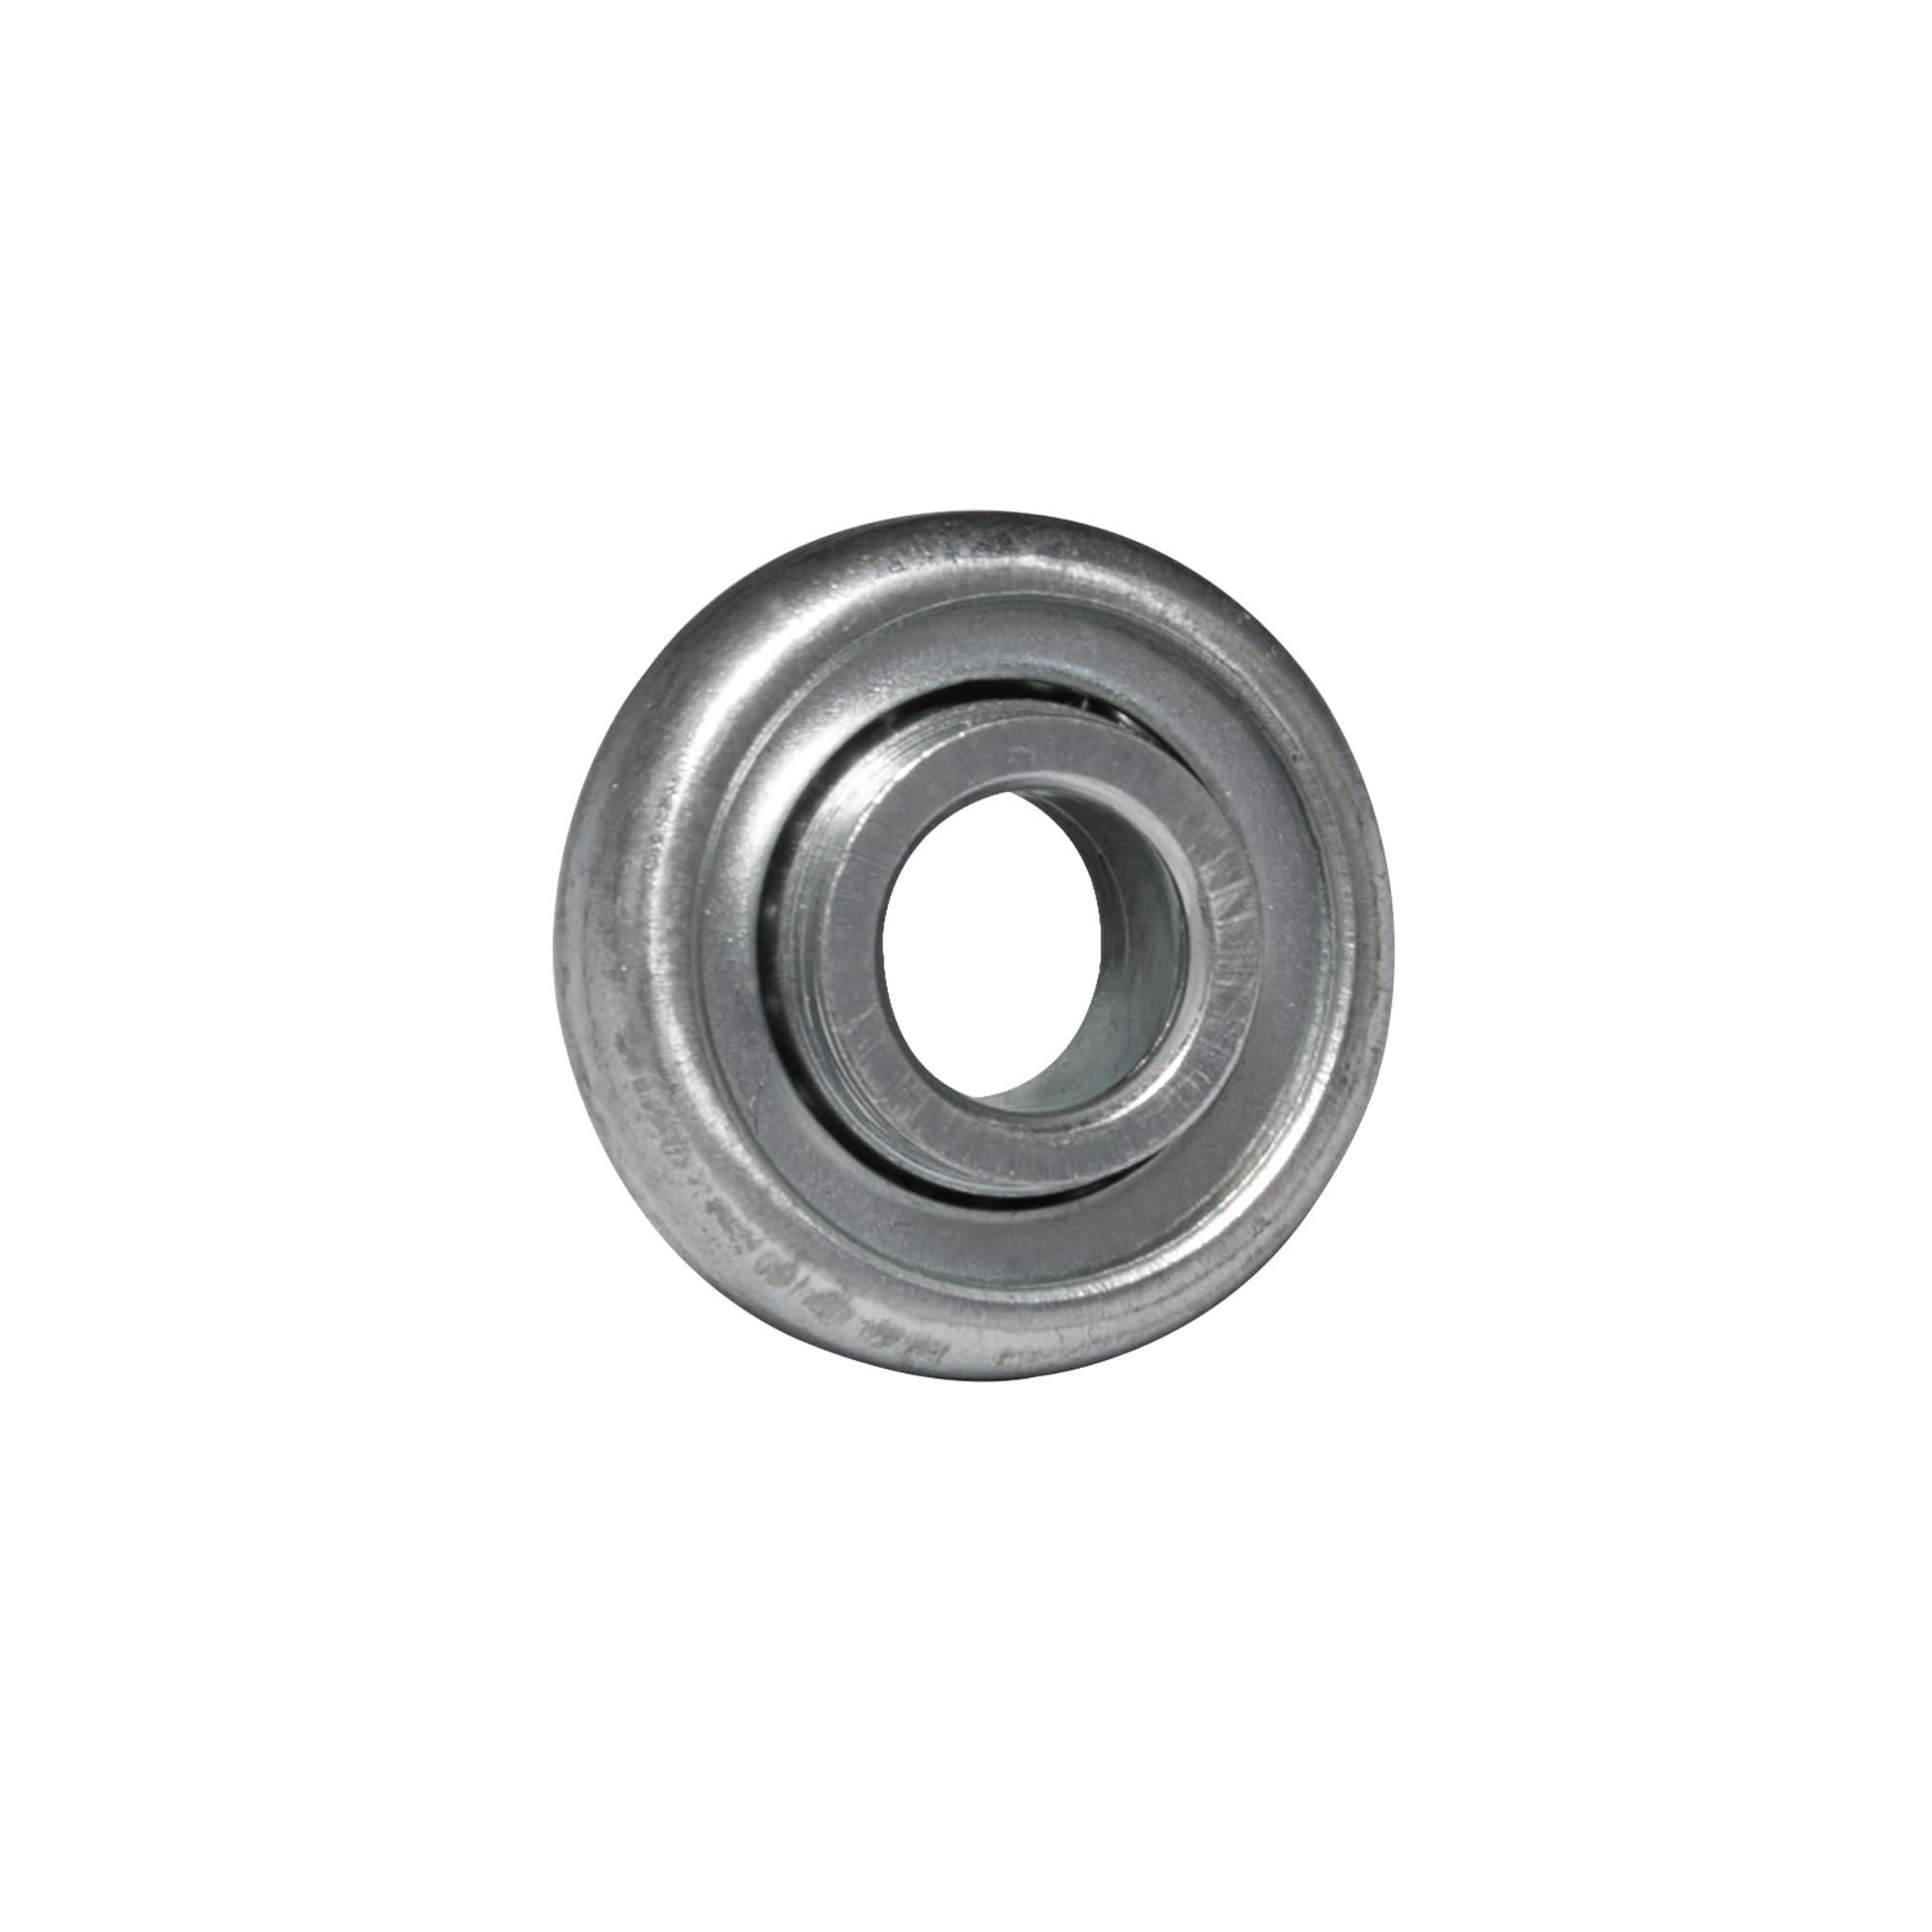 jarolift mini kugellager 28mm mit bund 10mm innendurchmesser qualit ts kugellager f. Black Bedroom Furniture Sets. Home Design Ideas